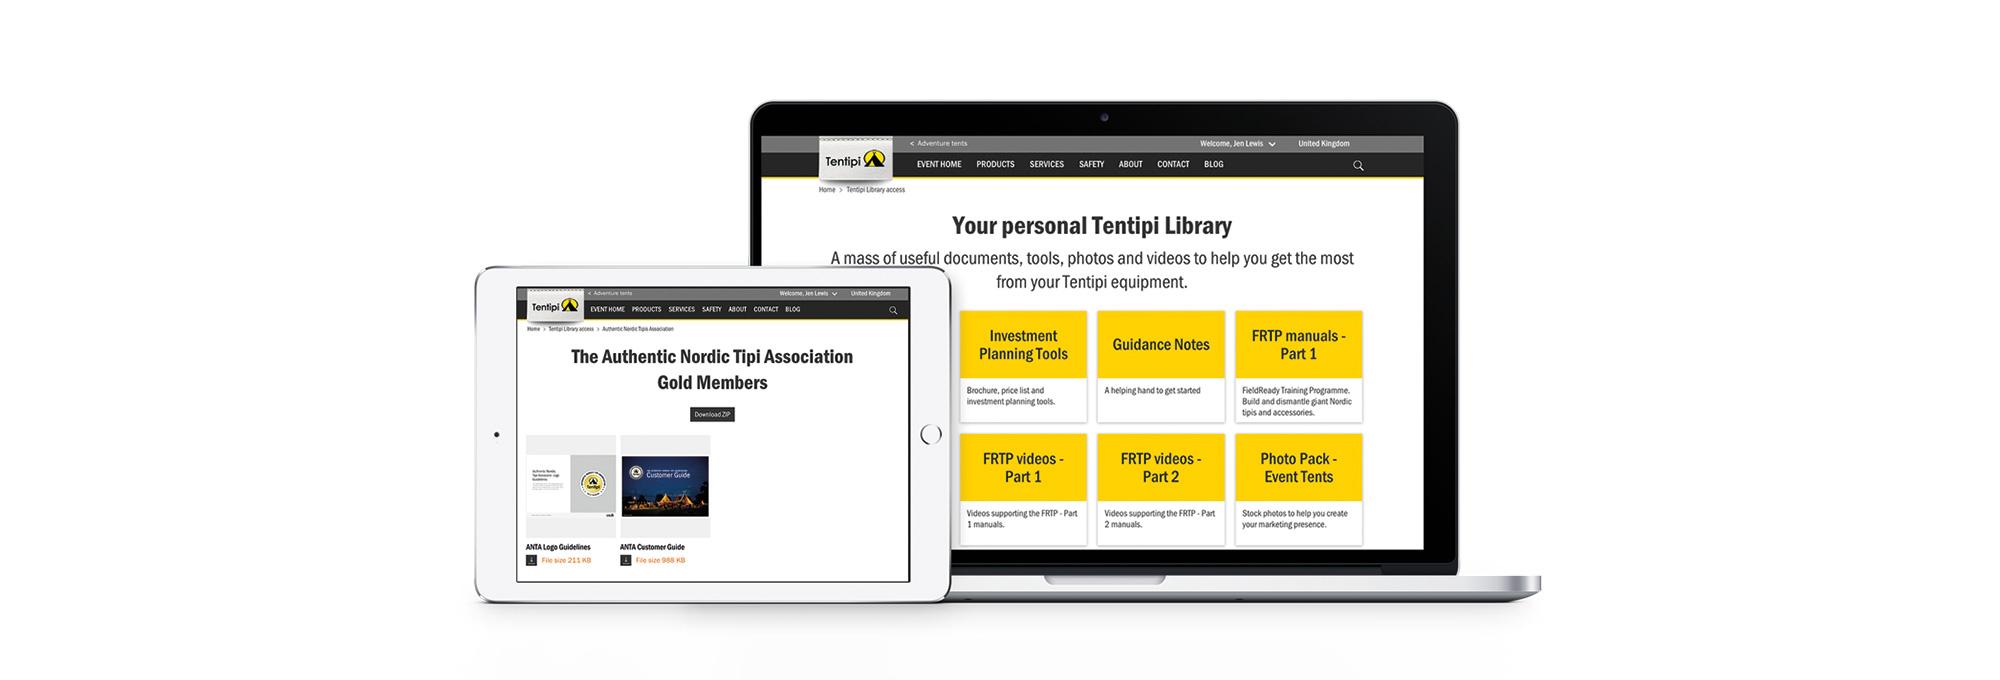 Tentipi library